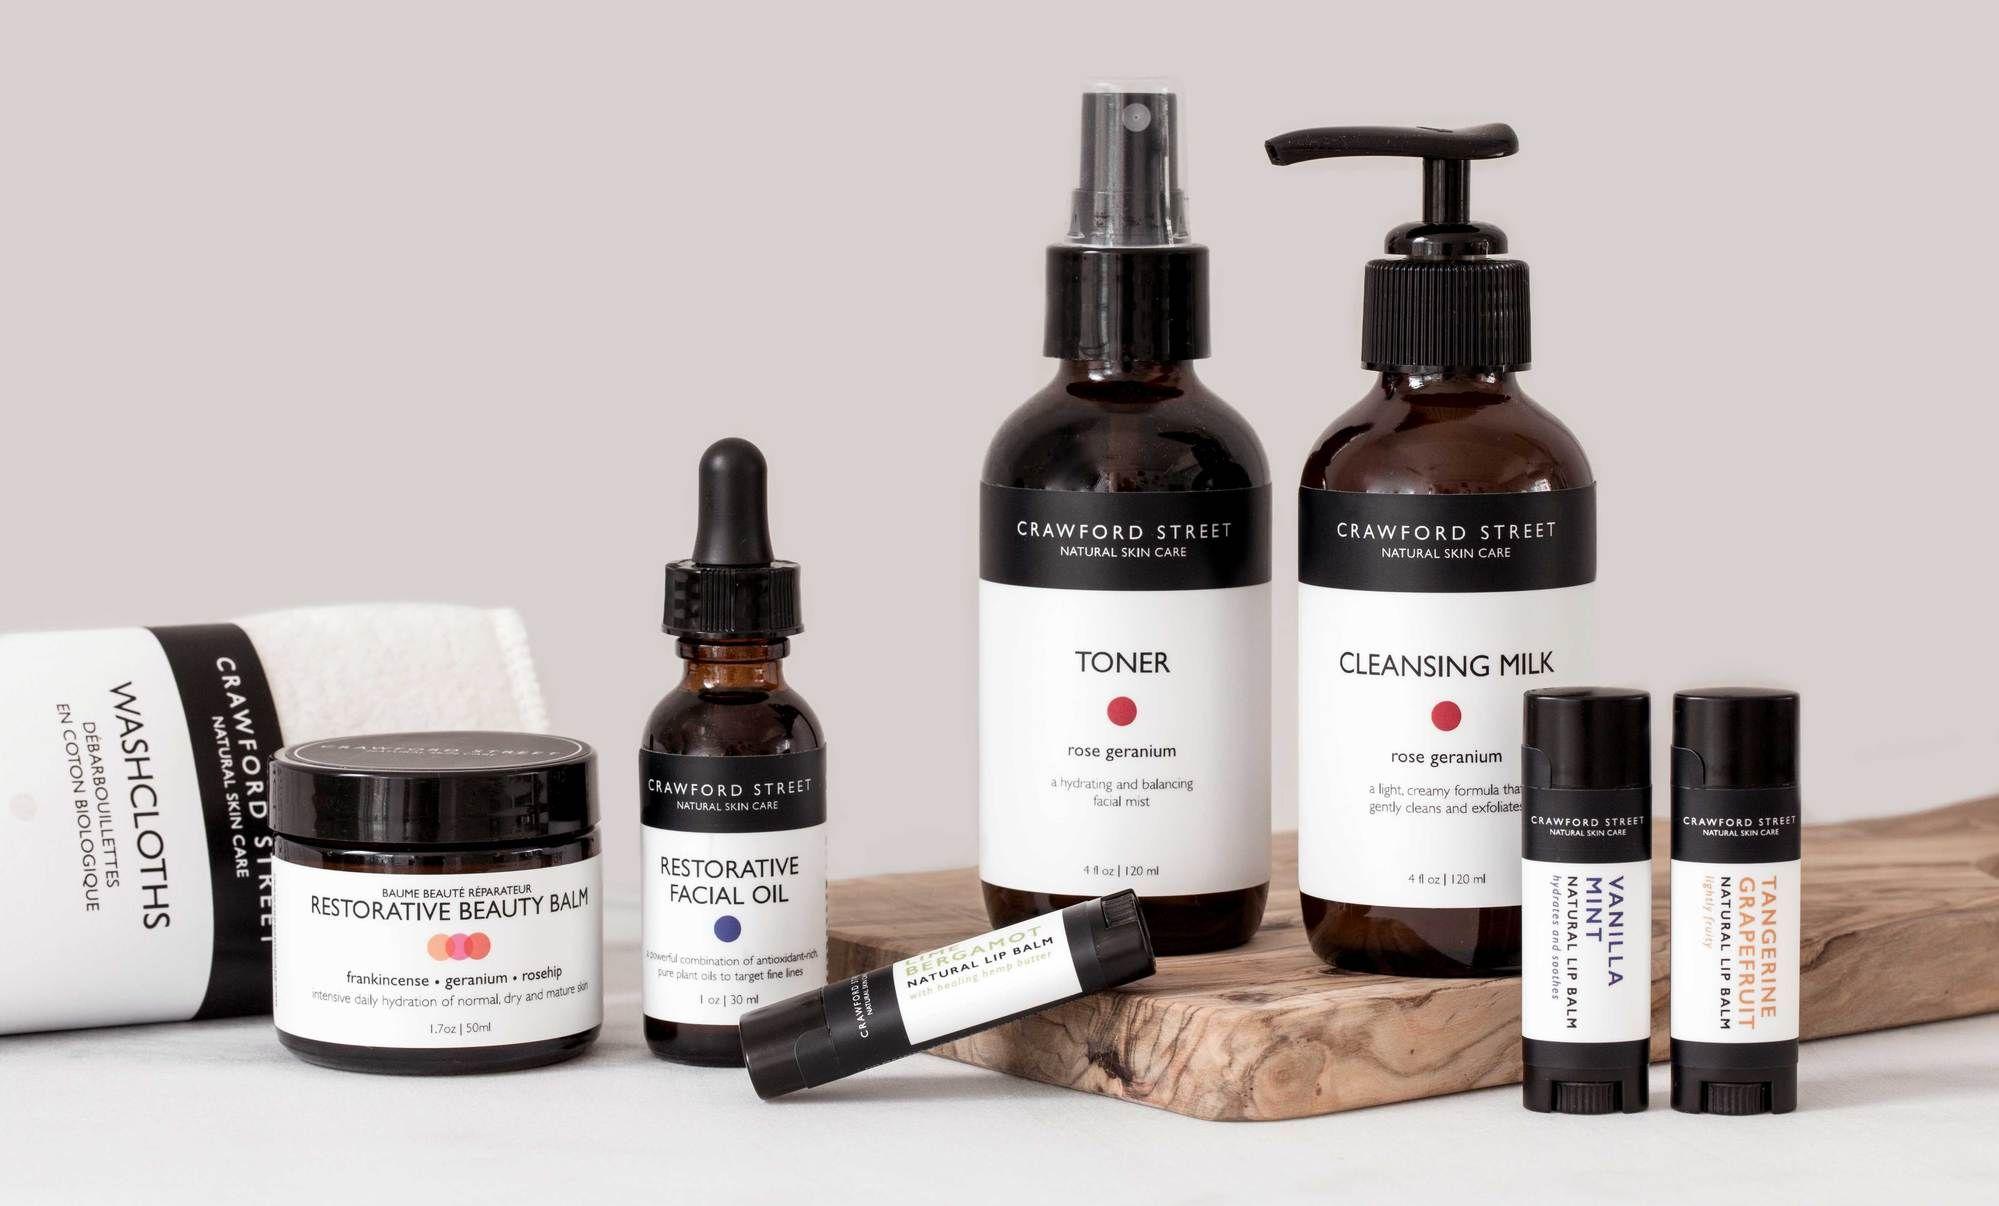 Crawford Street Natural Skin Care Produtos veganos, Veganos